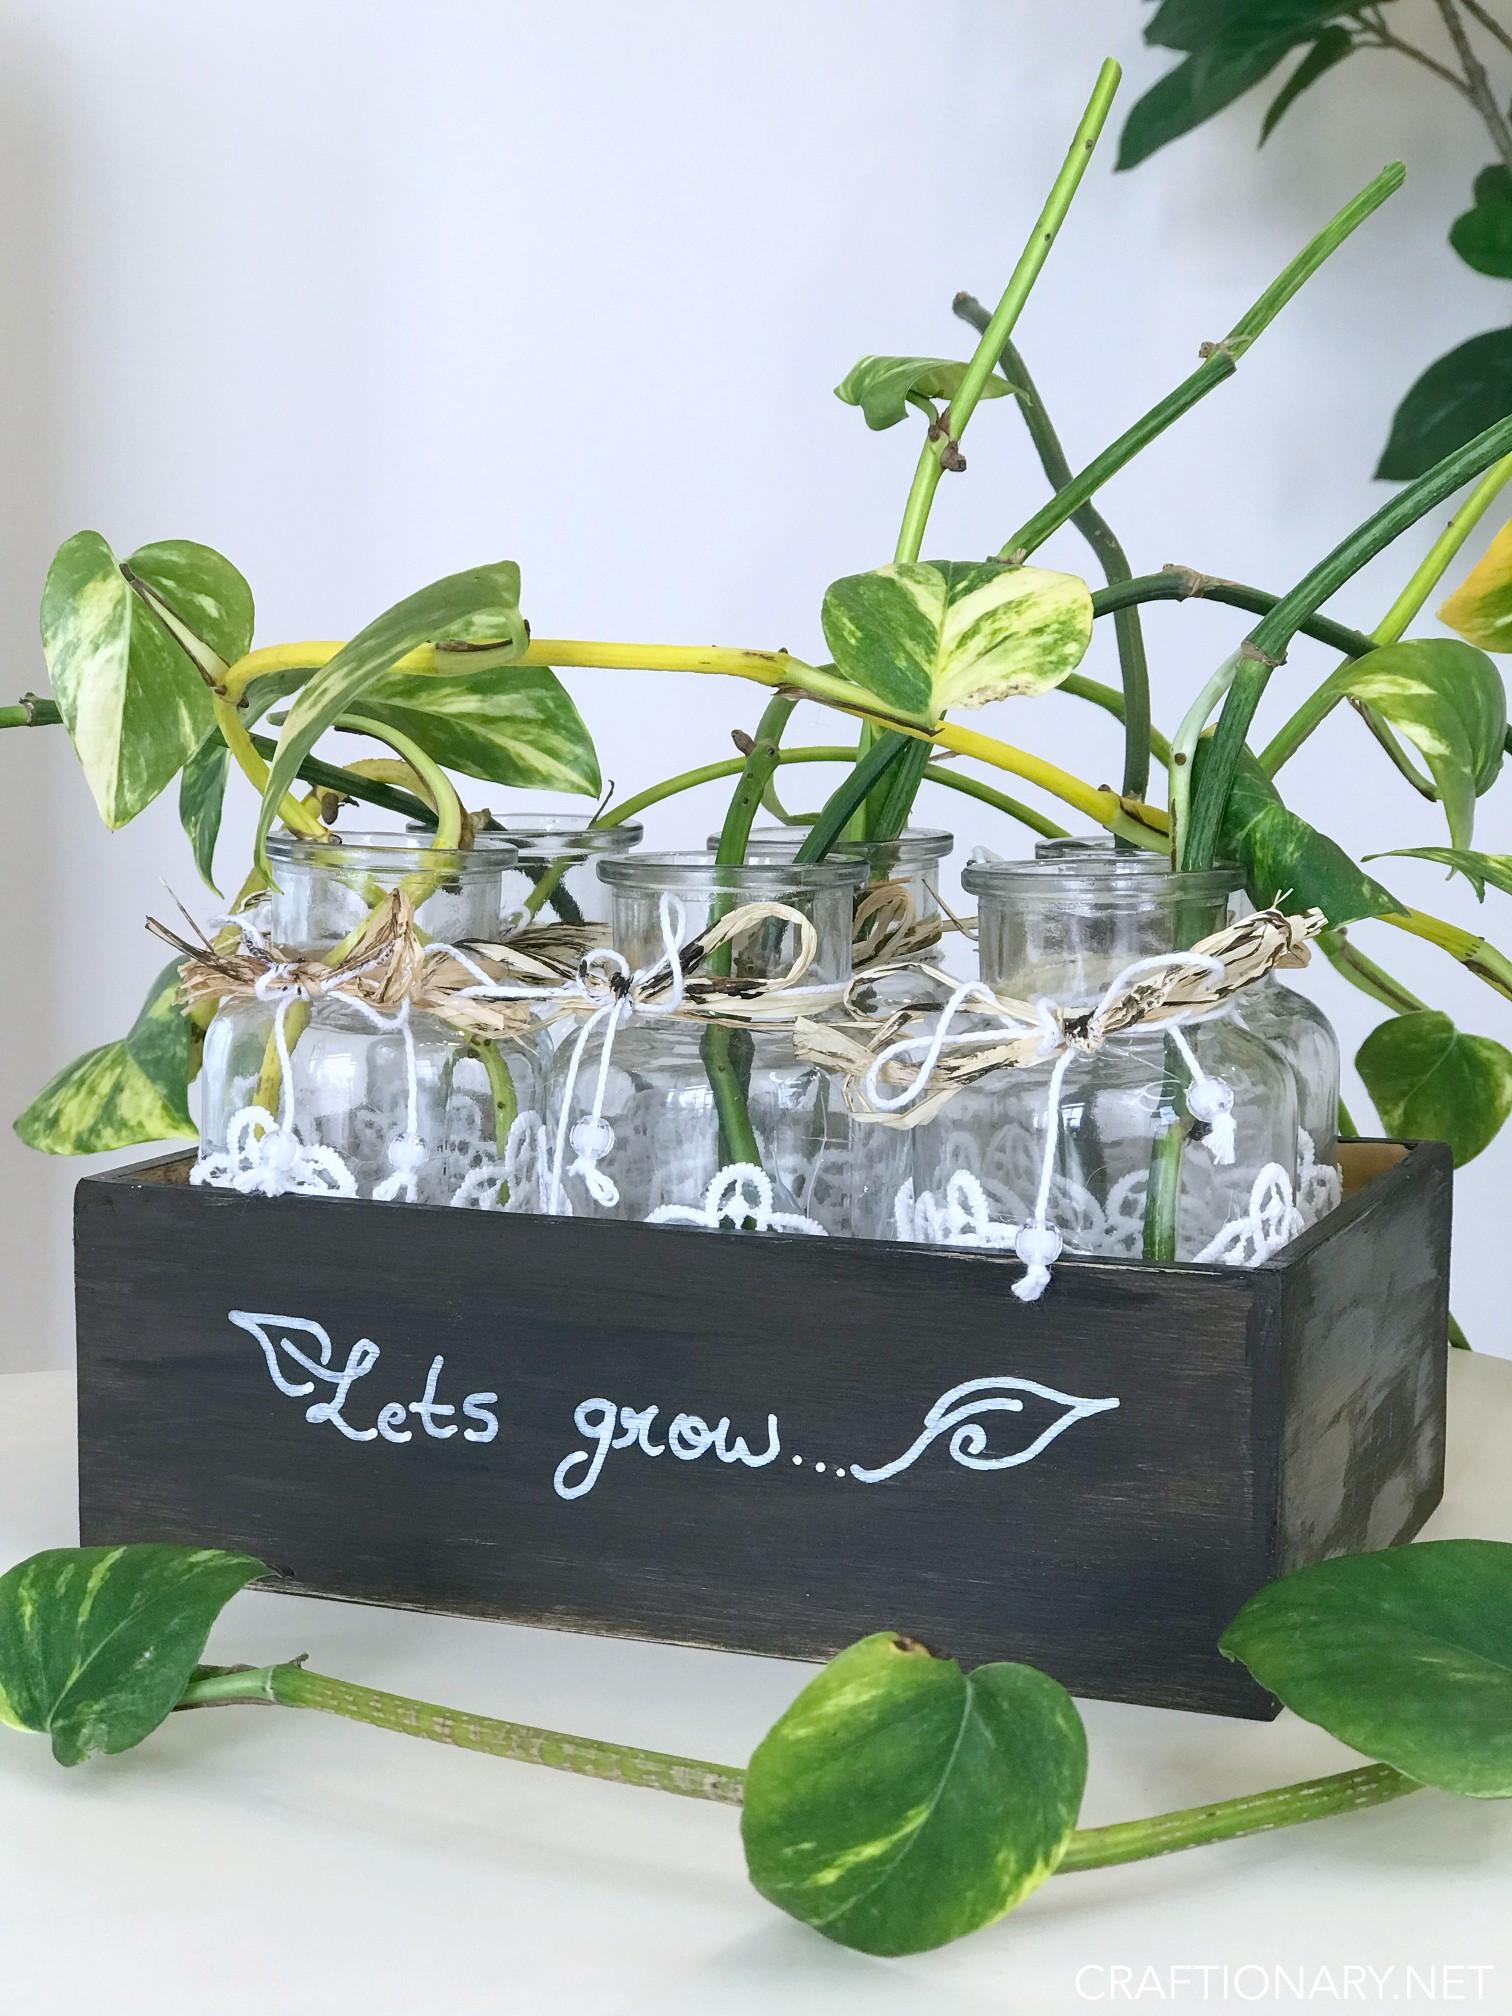 diy-plant-propagation-station-simple-idea